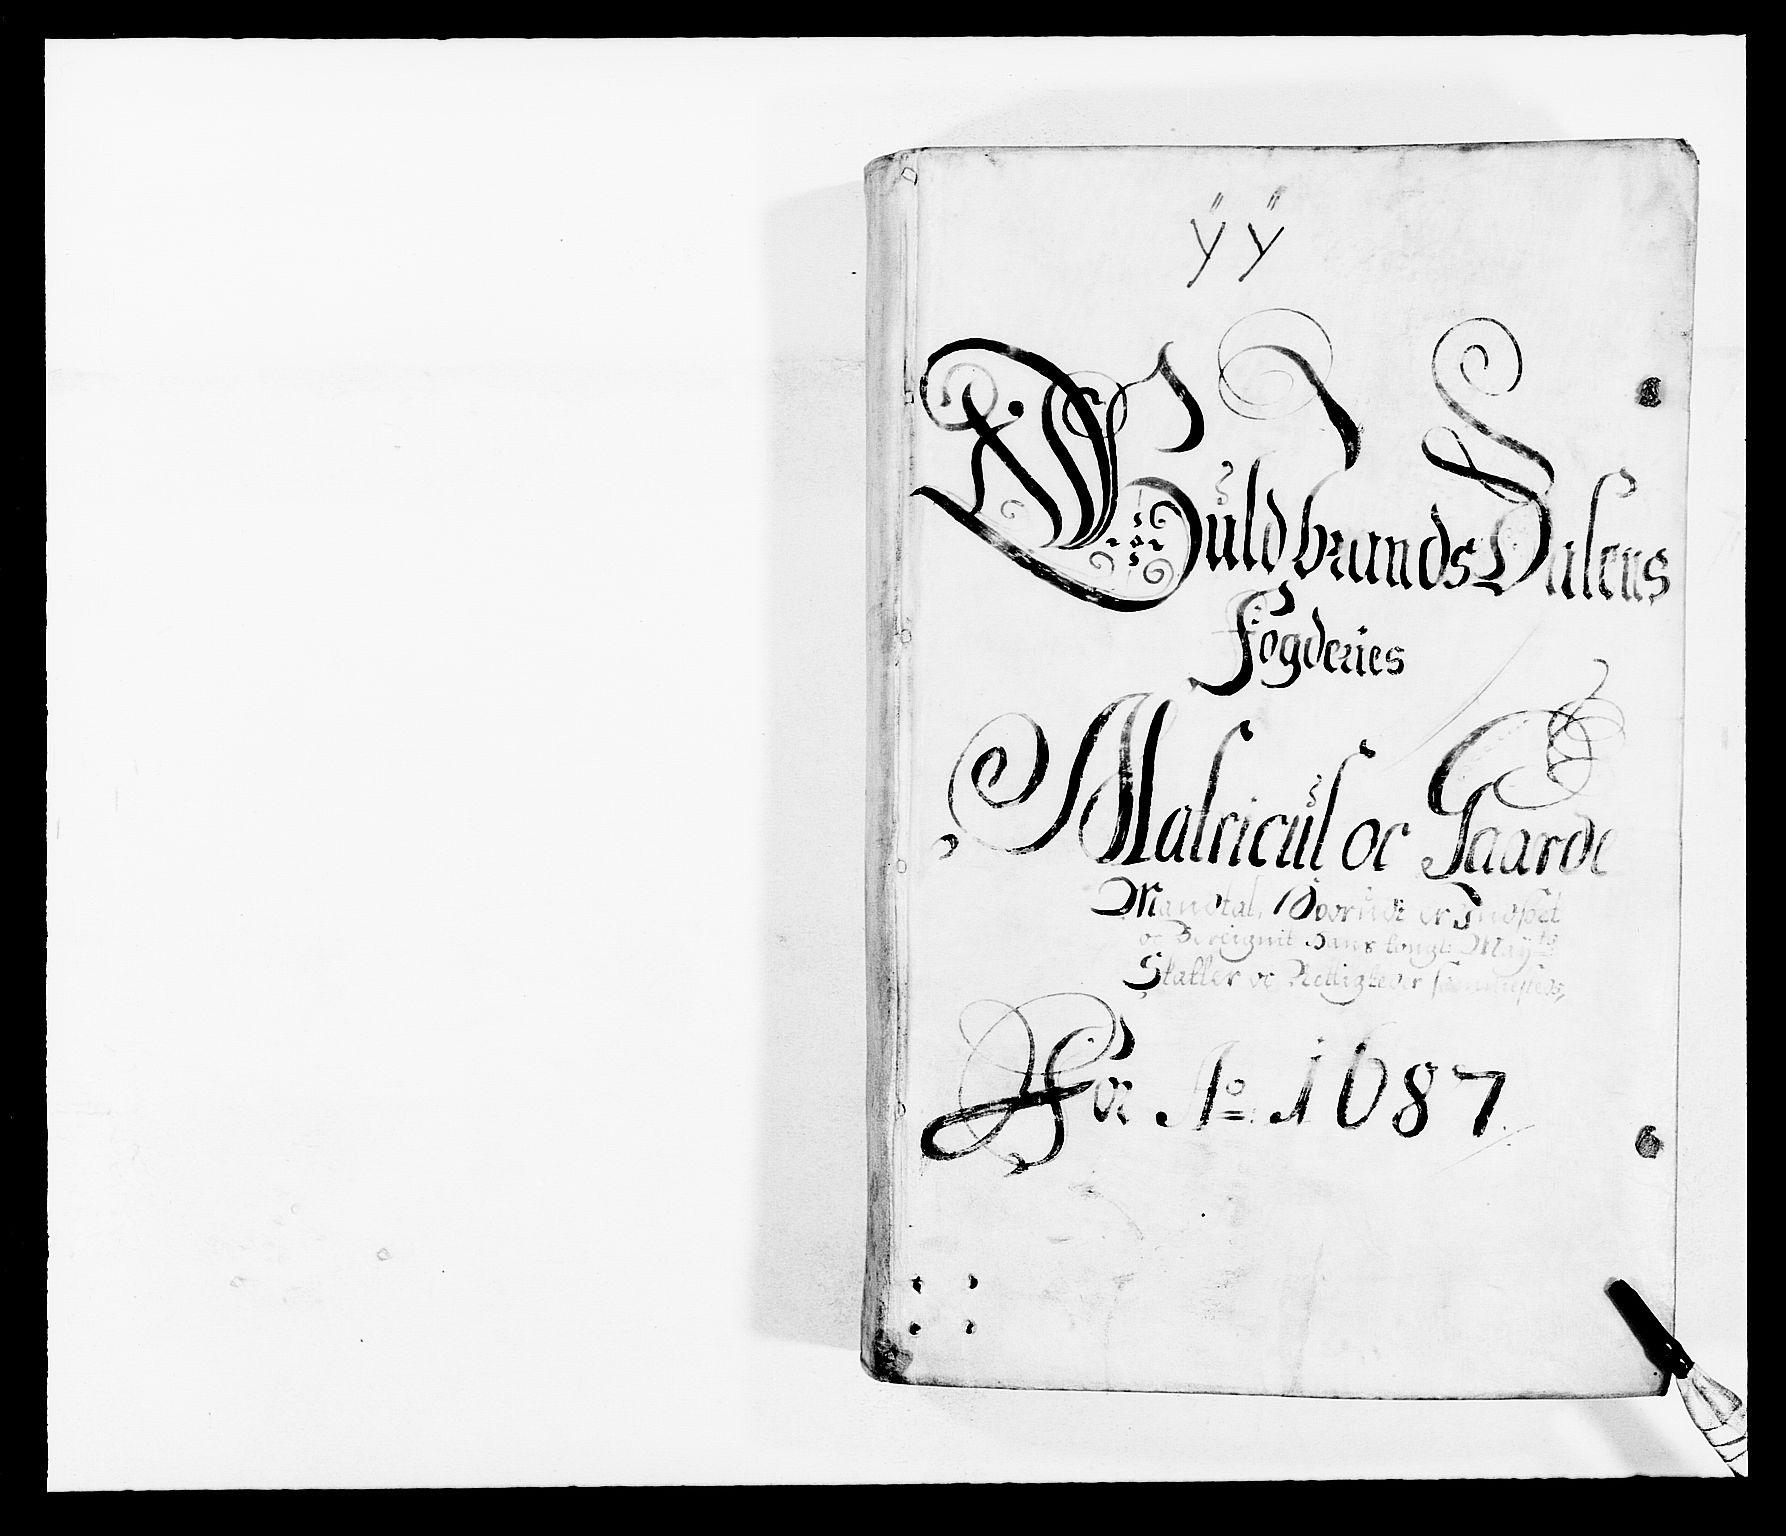 RA, Rentekammeret inntil 1814, Reviderte regnskaper, Fogderegnskap, R17/L1162: Fogderegnskap Gudbrandsdal, 1682-1689, s. 91